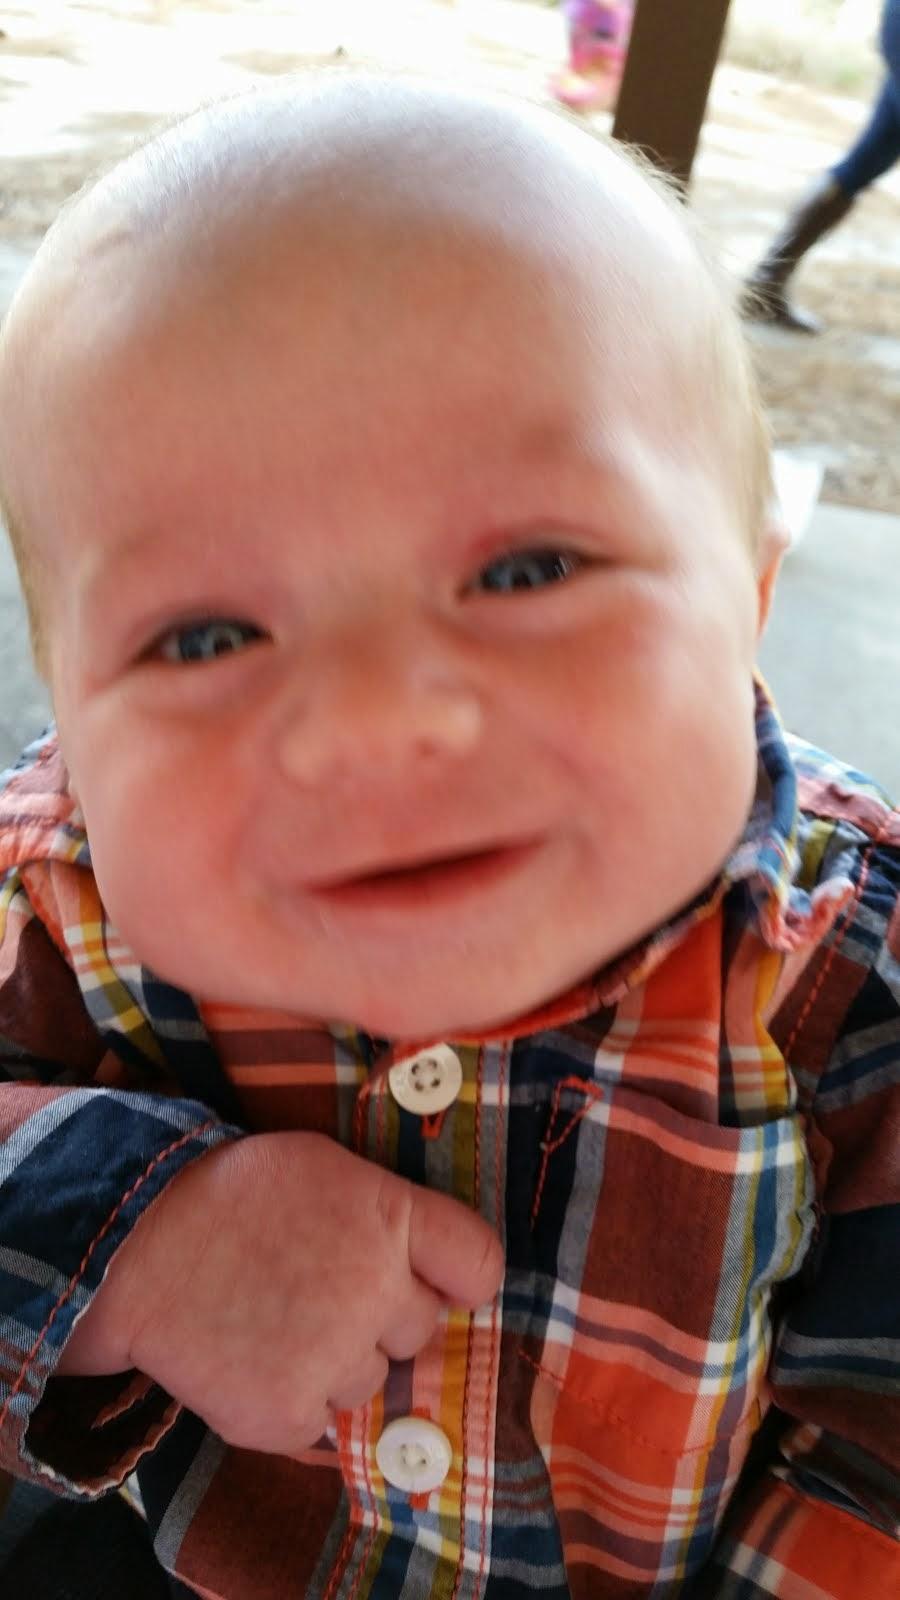 Radley - 2 months old